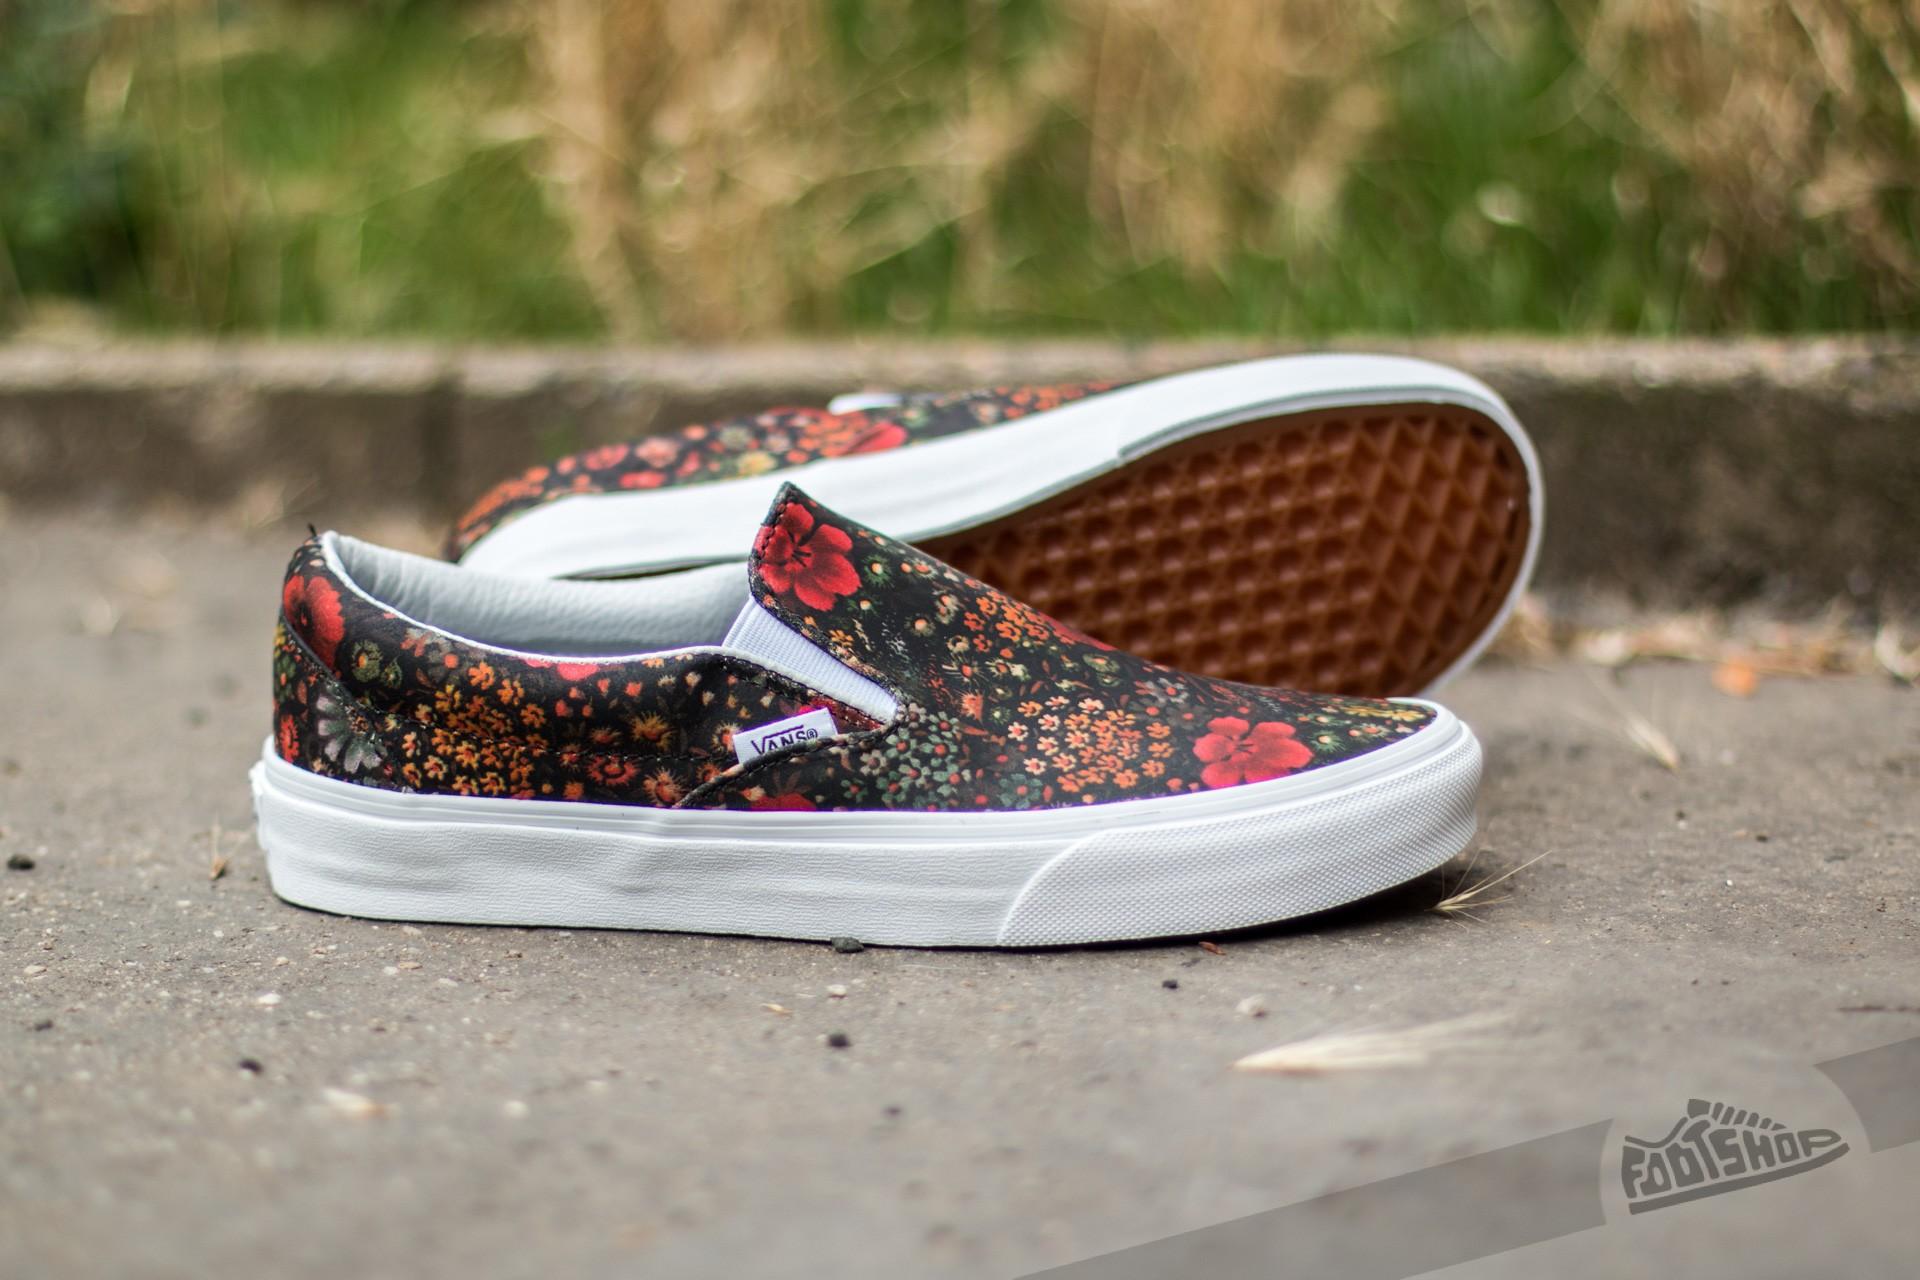 Vans Classic Slip On (Floral Leather) Multi True White | Footshop